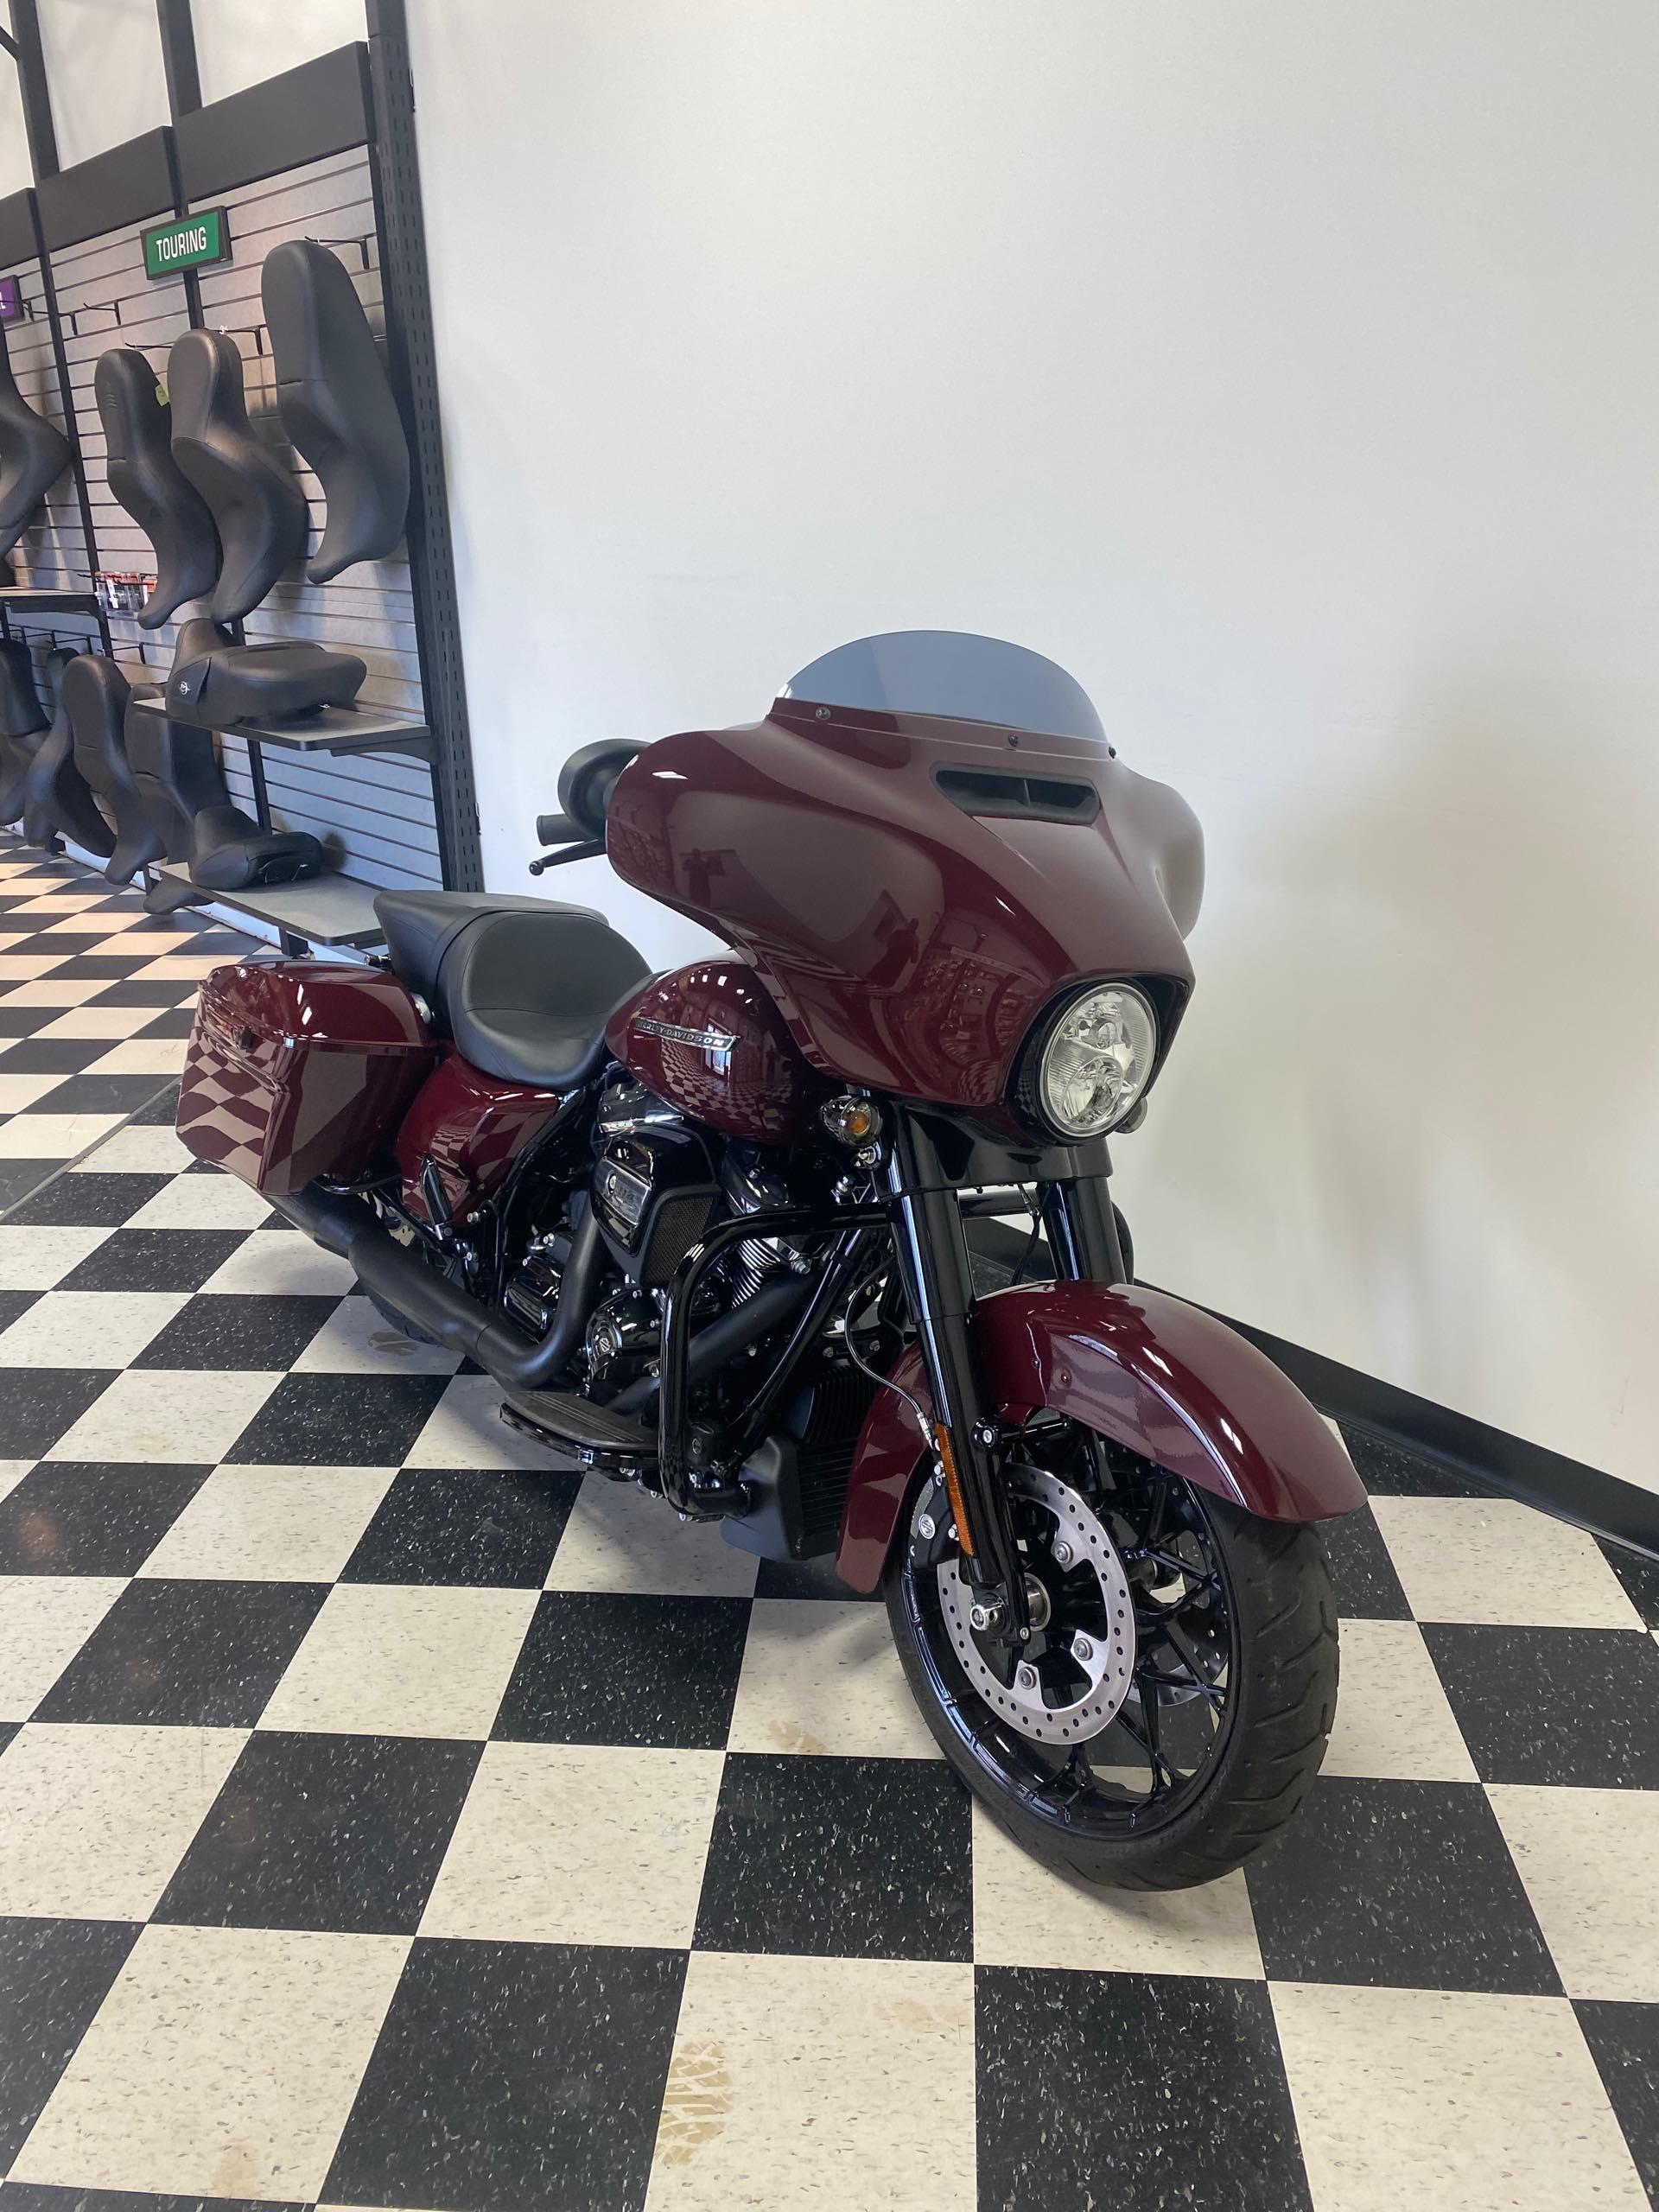 2020 Harley-Davidson Touring Street Glide Special at Deluxe Harley Davidson